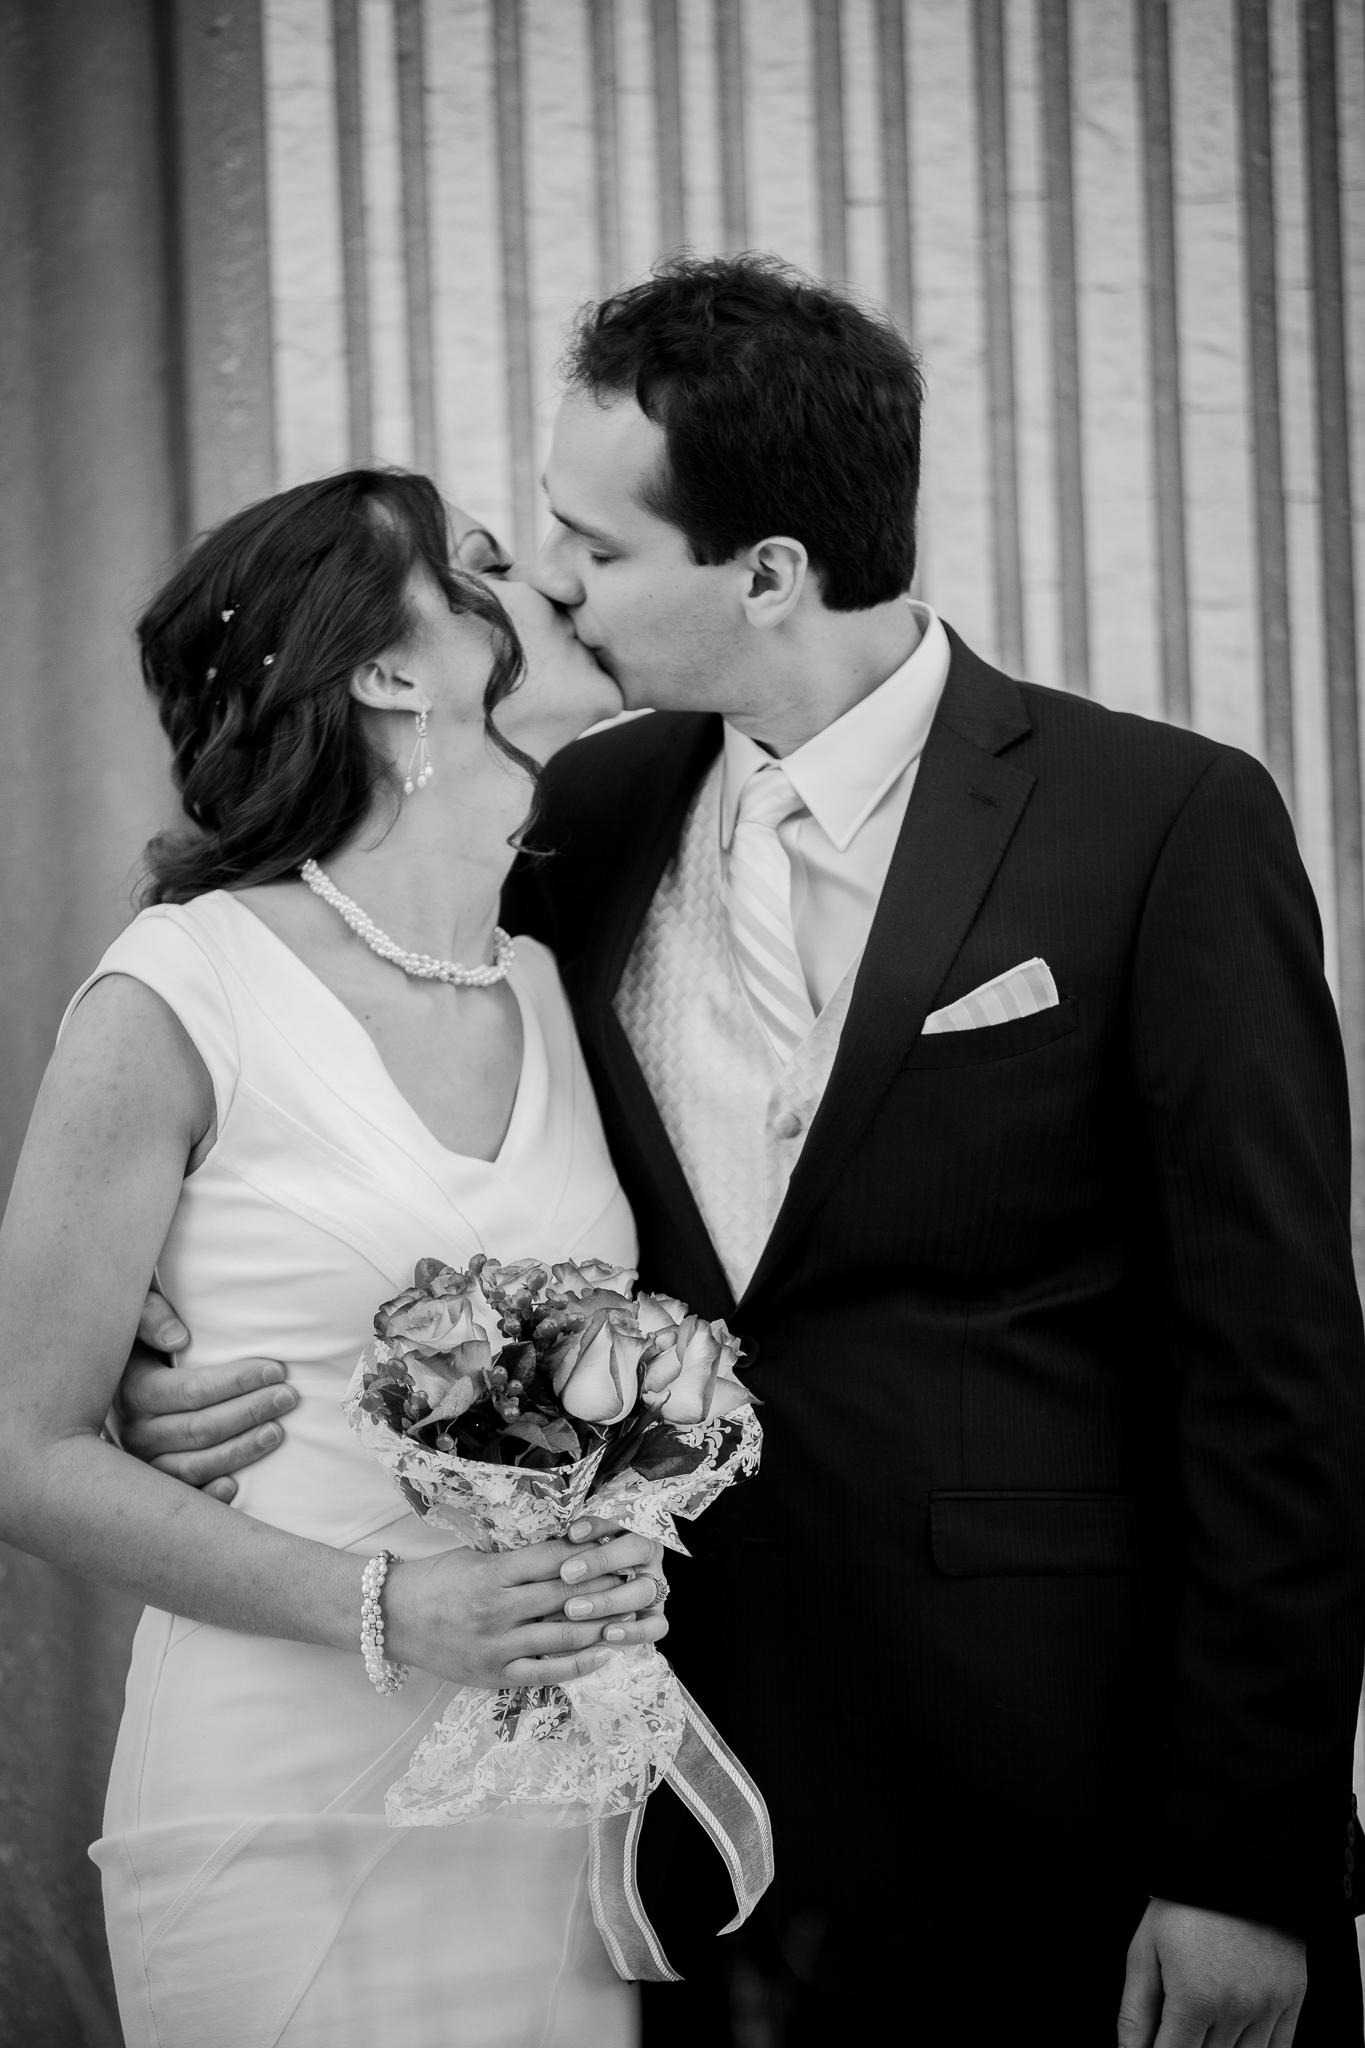 Toronto Wedding Photography - Zoya & Alexei -6.jpg